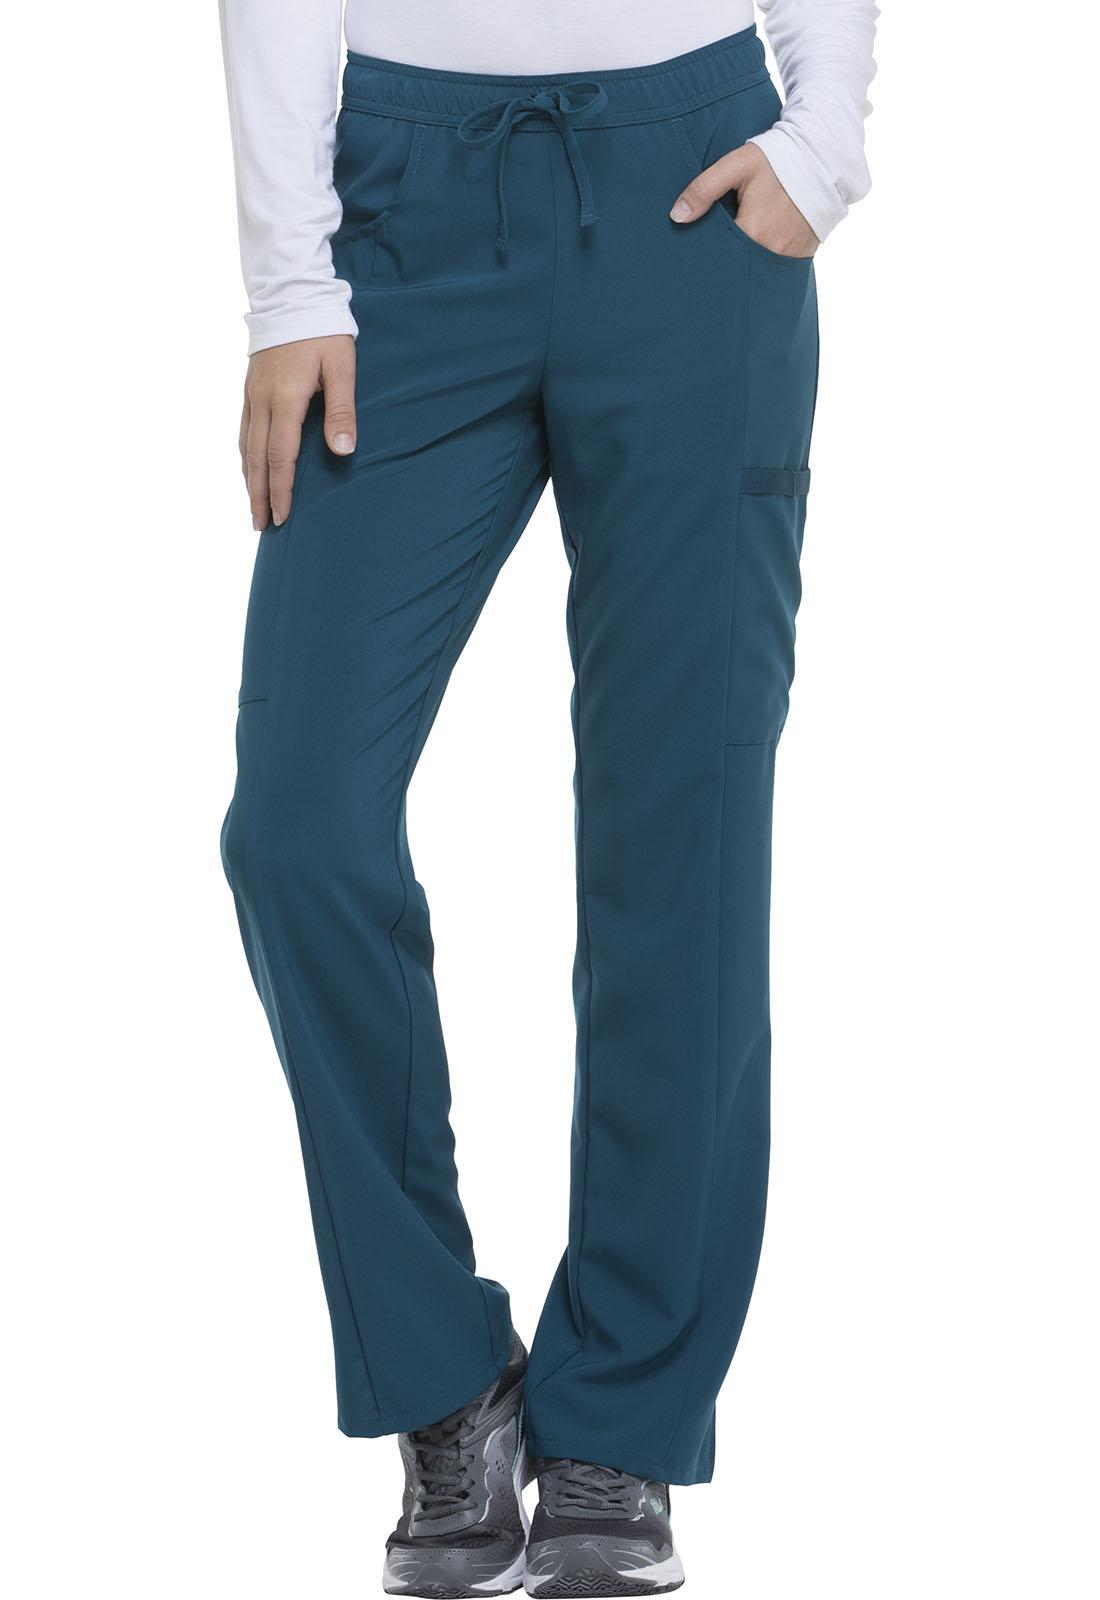 cdd98e1d605 Dickies EDS Essentials Women's Mid Rise Straight Leg Drawstring Pant Blue